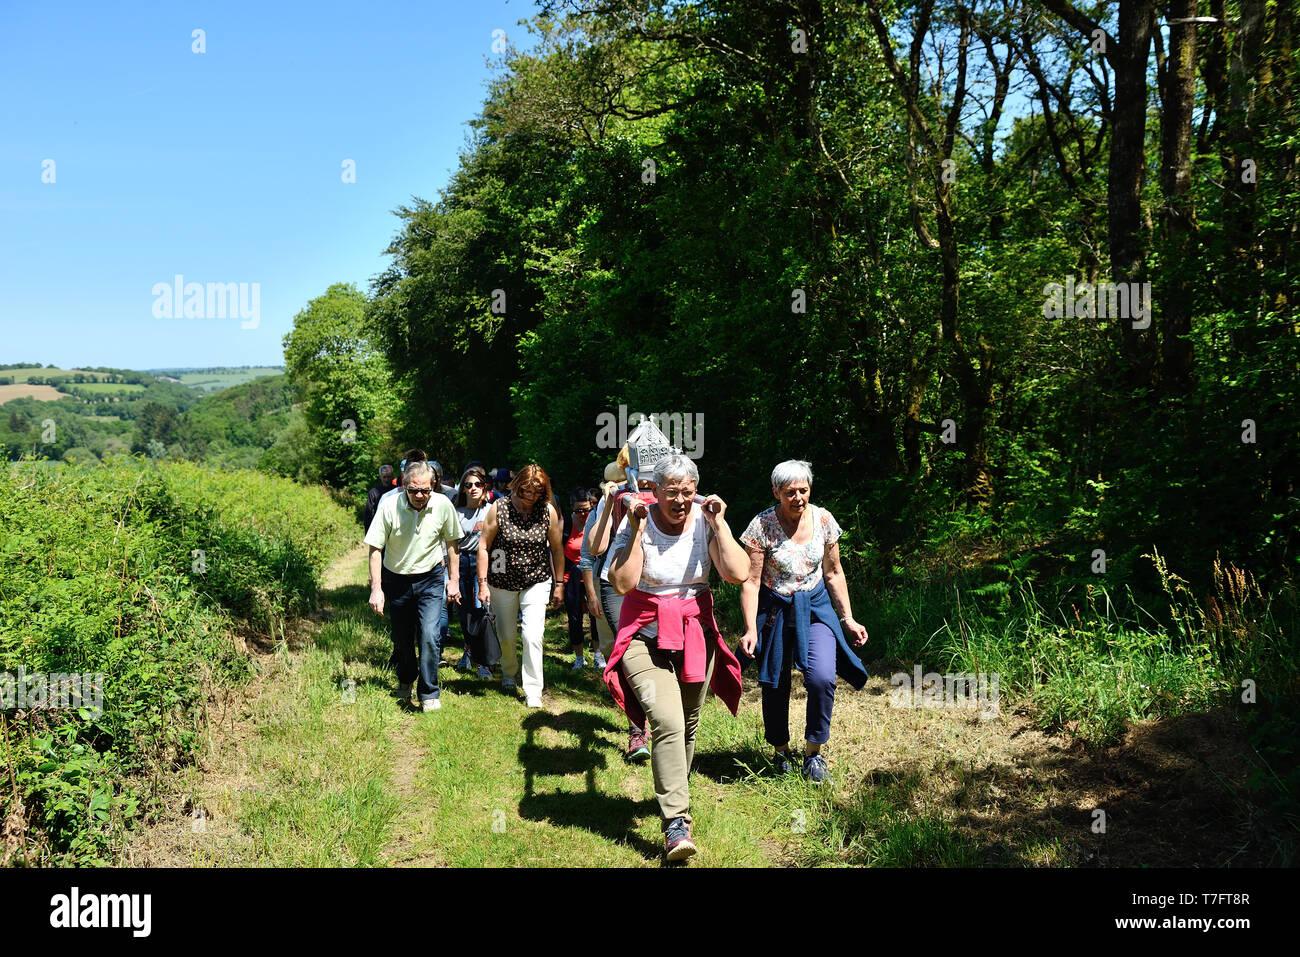 Landeleau (Brittany, north-western France), on 2018/05/20: annual Whit Sunday ÒTromenieÓ Breton pardon. ÒTro ar relegouÓ procession around the village - Stock Image